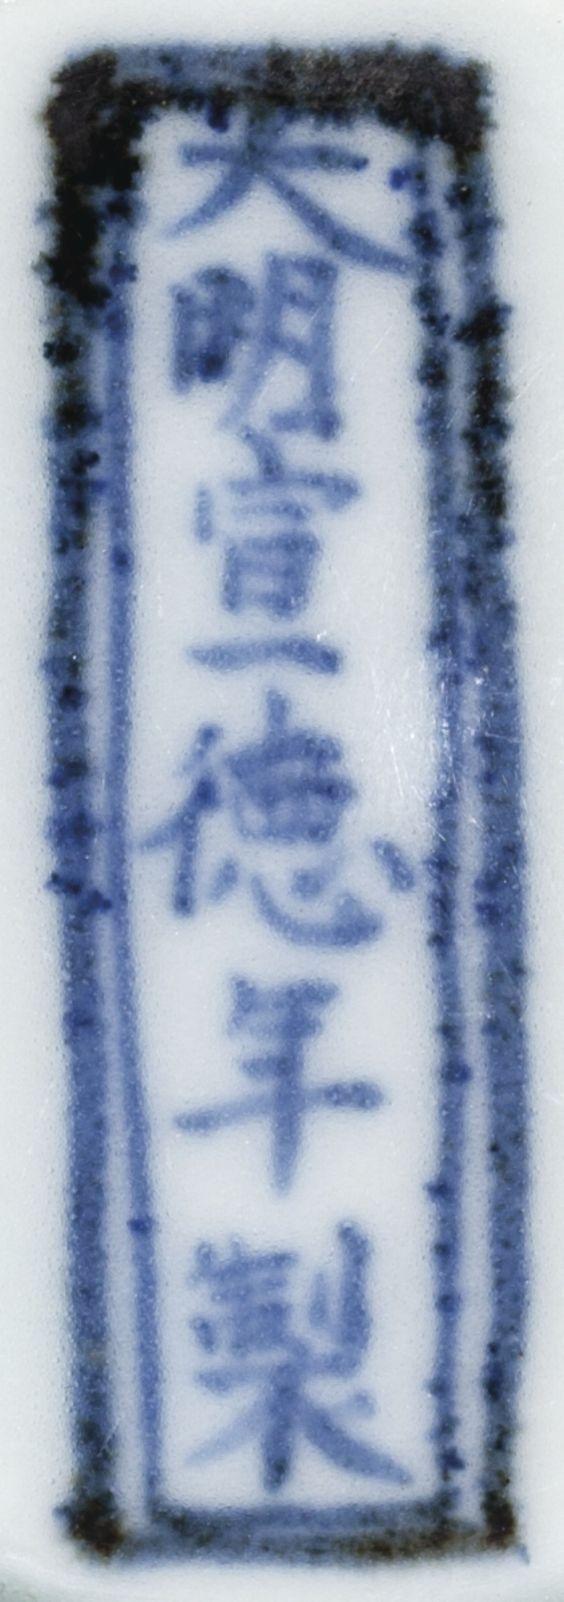 12 best ming dynasty vase images on Pinterest | Blue china, Chinese ...